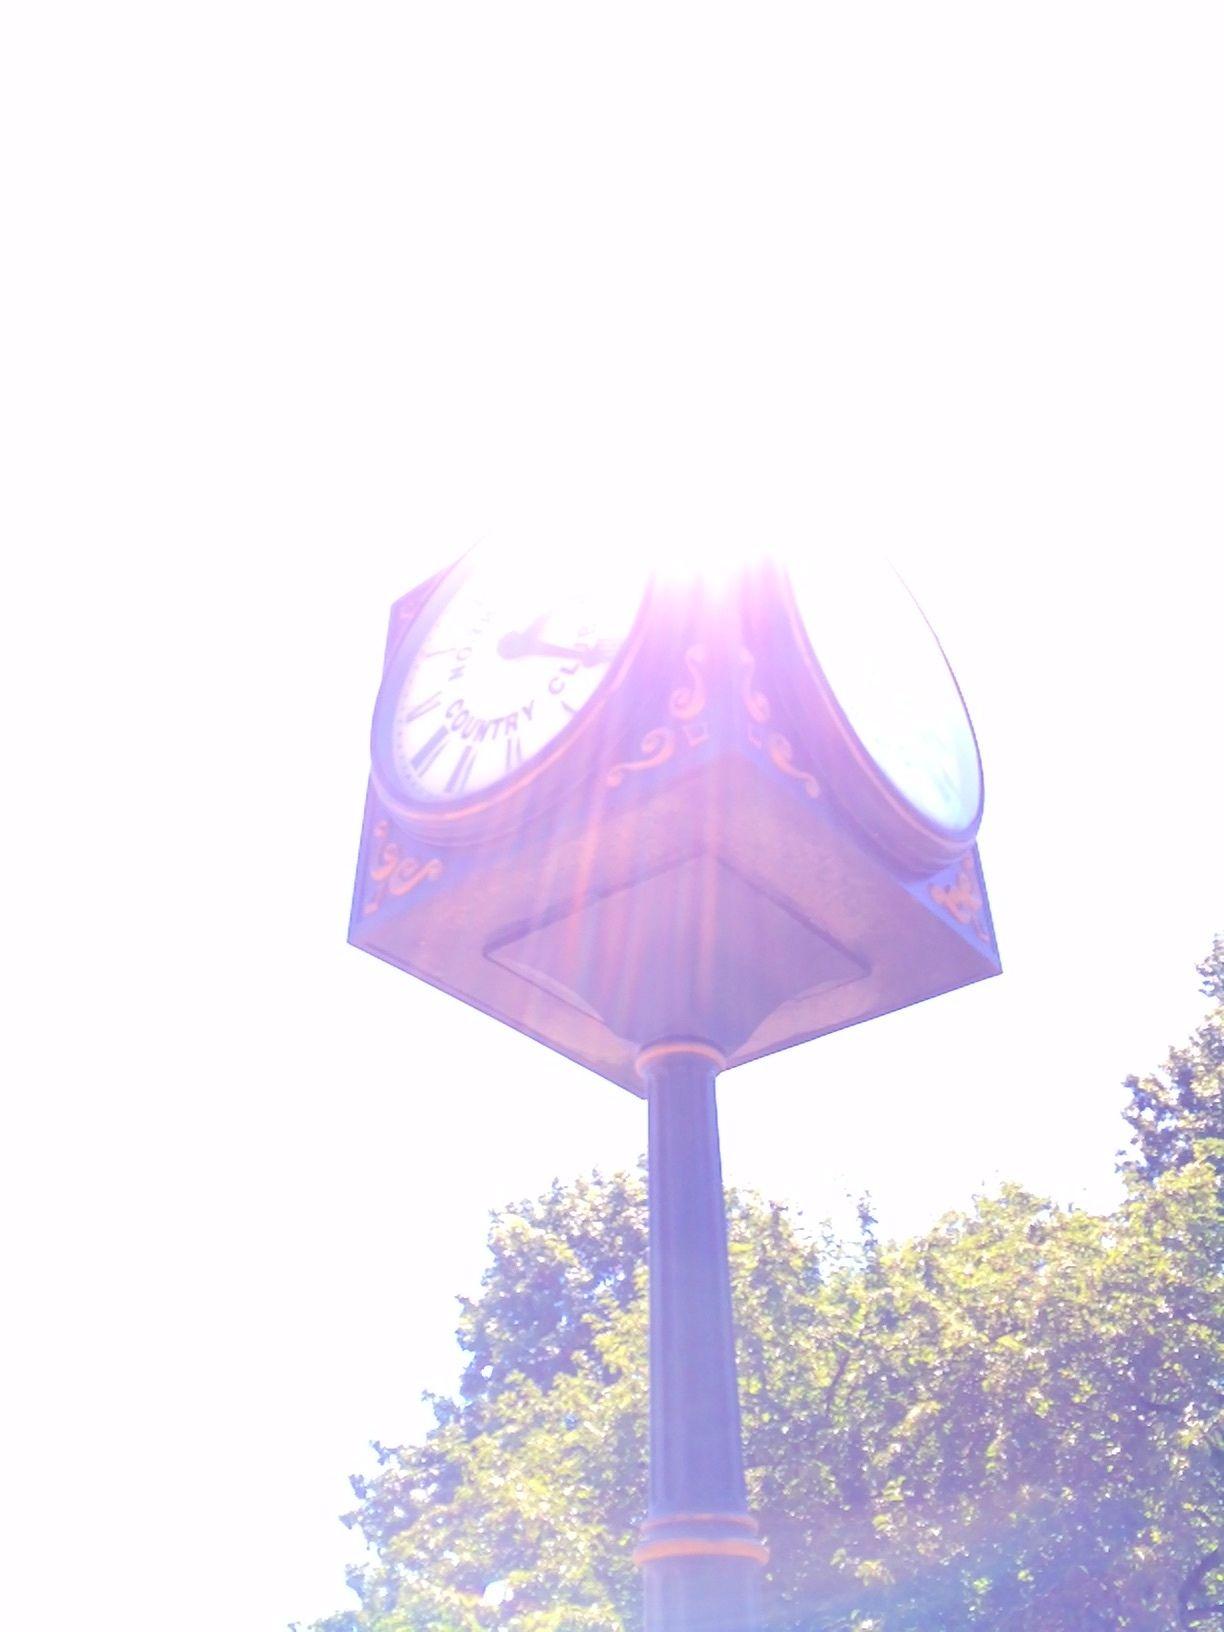 Norwood Clock Tower Clock tower, Norwood, Tower